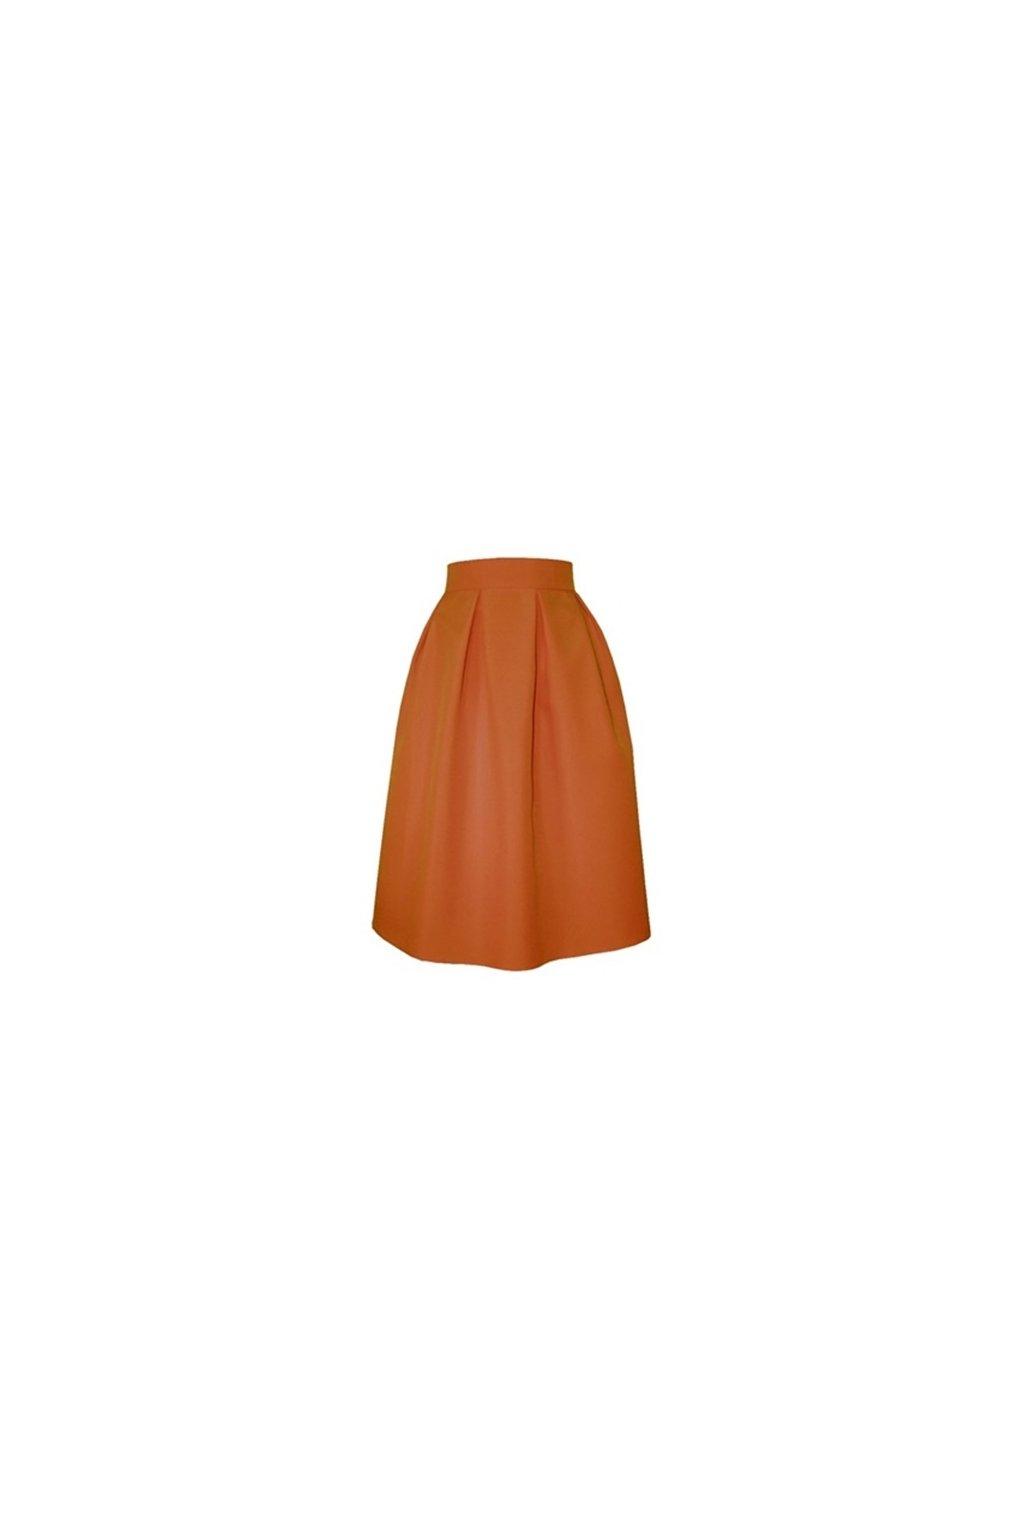 b53408d8a47b Áčková sukňa s protizáhybmi tehlová - Tentation.sk